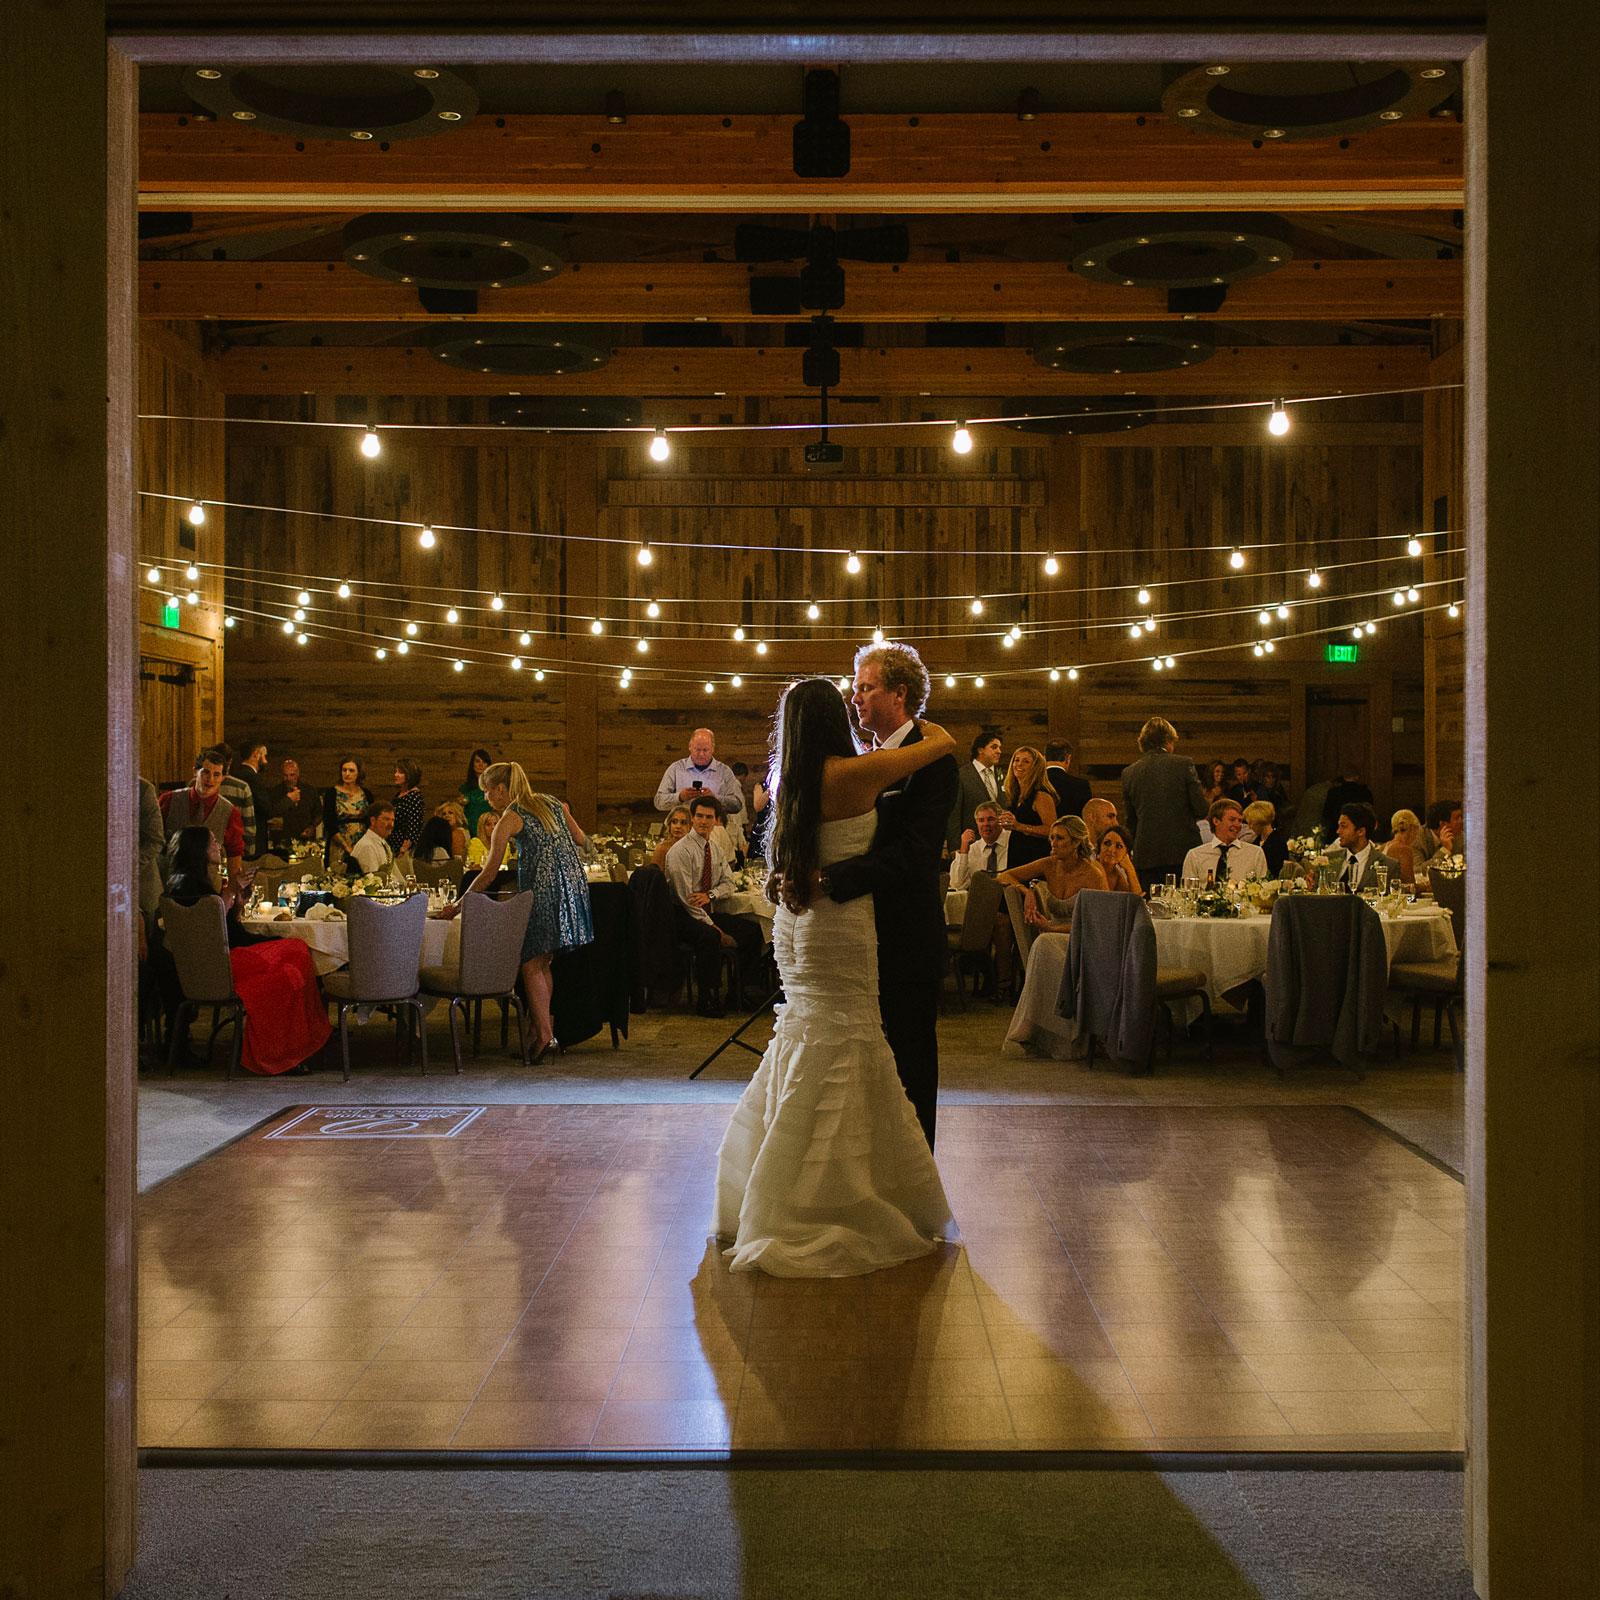 Teak Dance Floor at a wedding